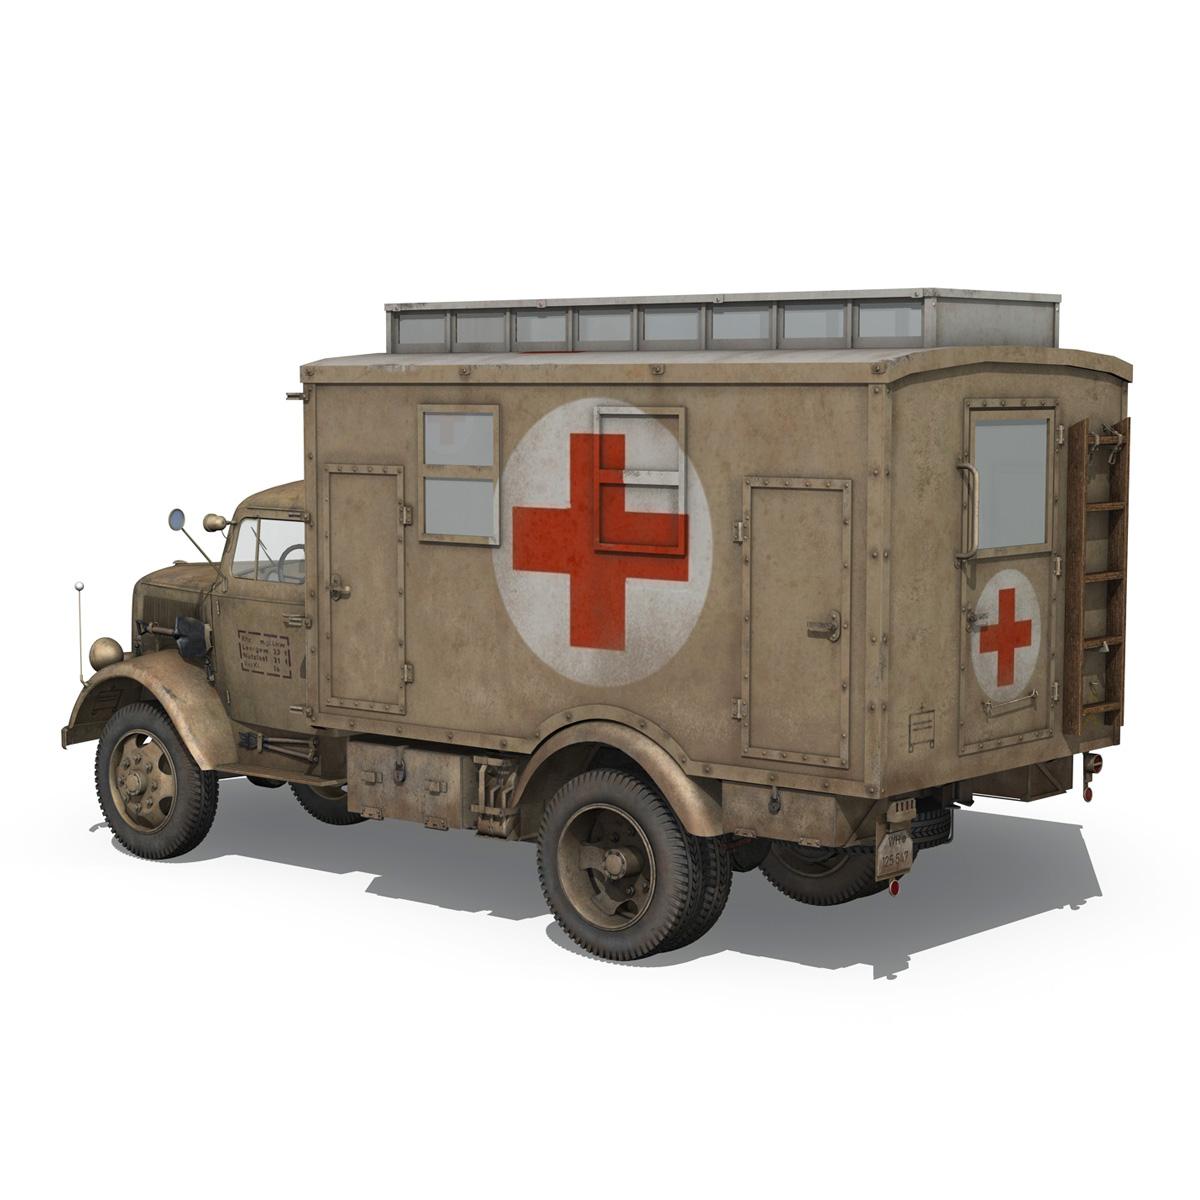 opel blitz – 3t ambulance truck – 2 pzdiv 3d model 3ds c4d fbx lwo lw lws obj 265756